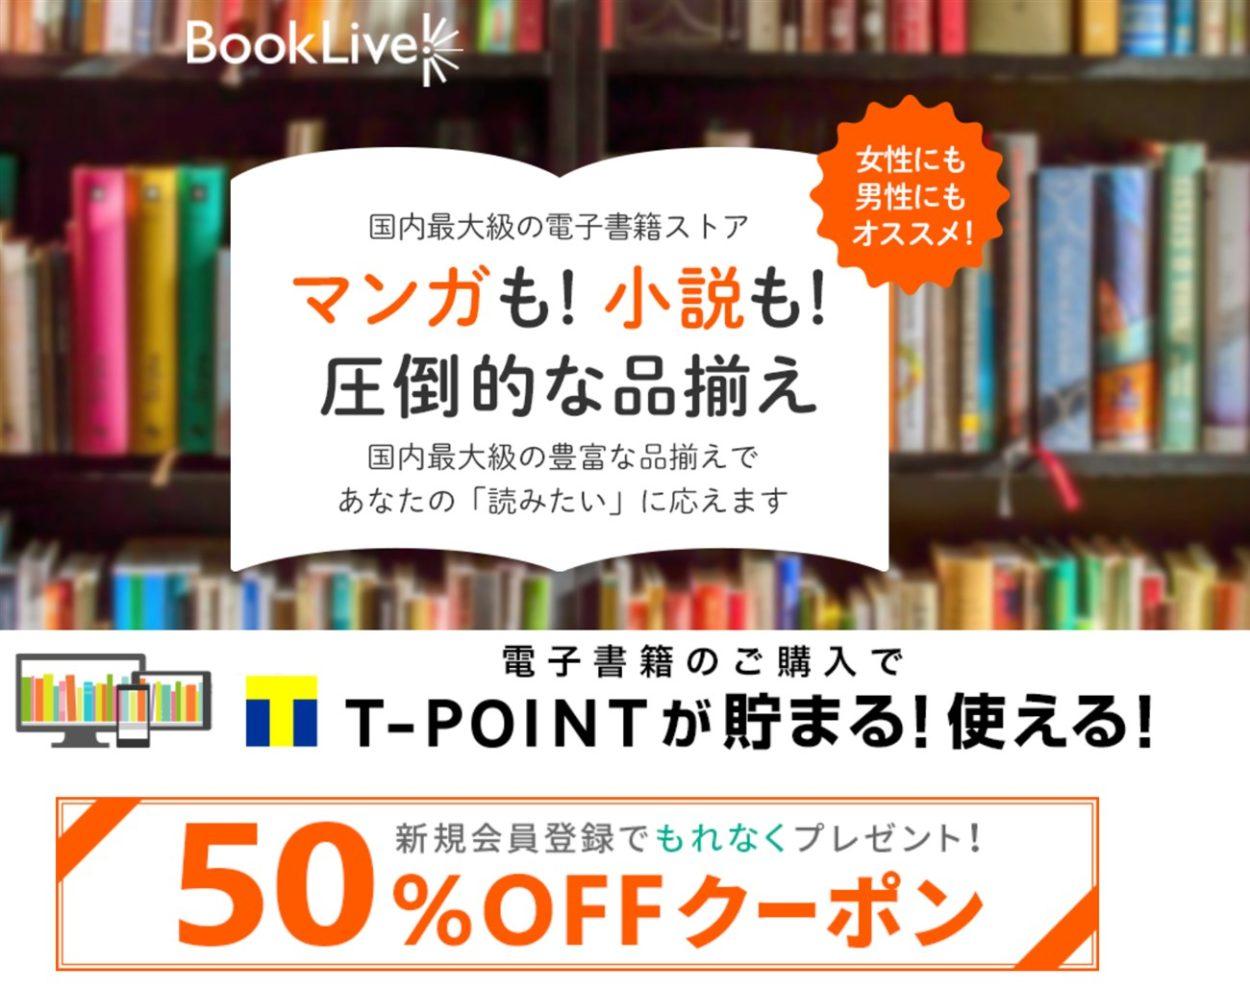 Booklive新規会員限定50%オフクーポン